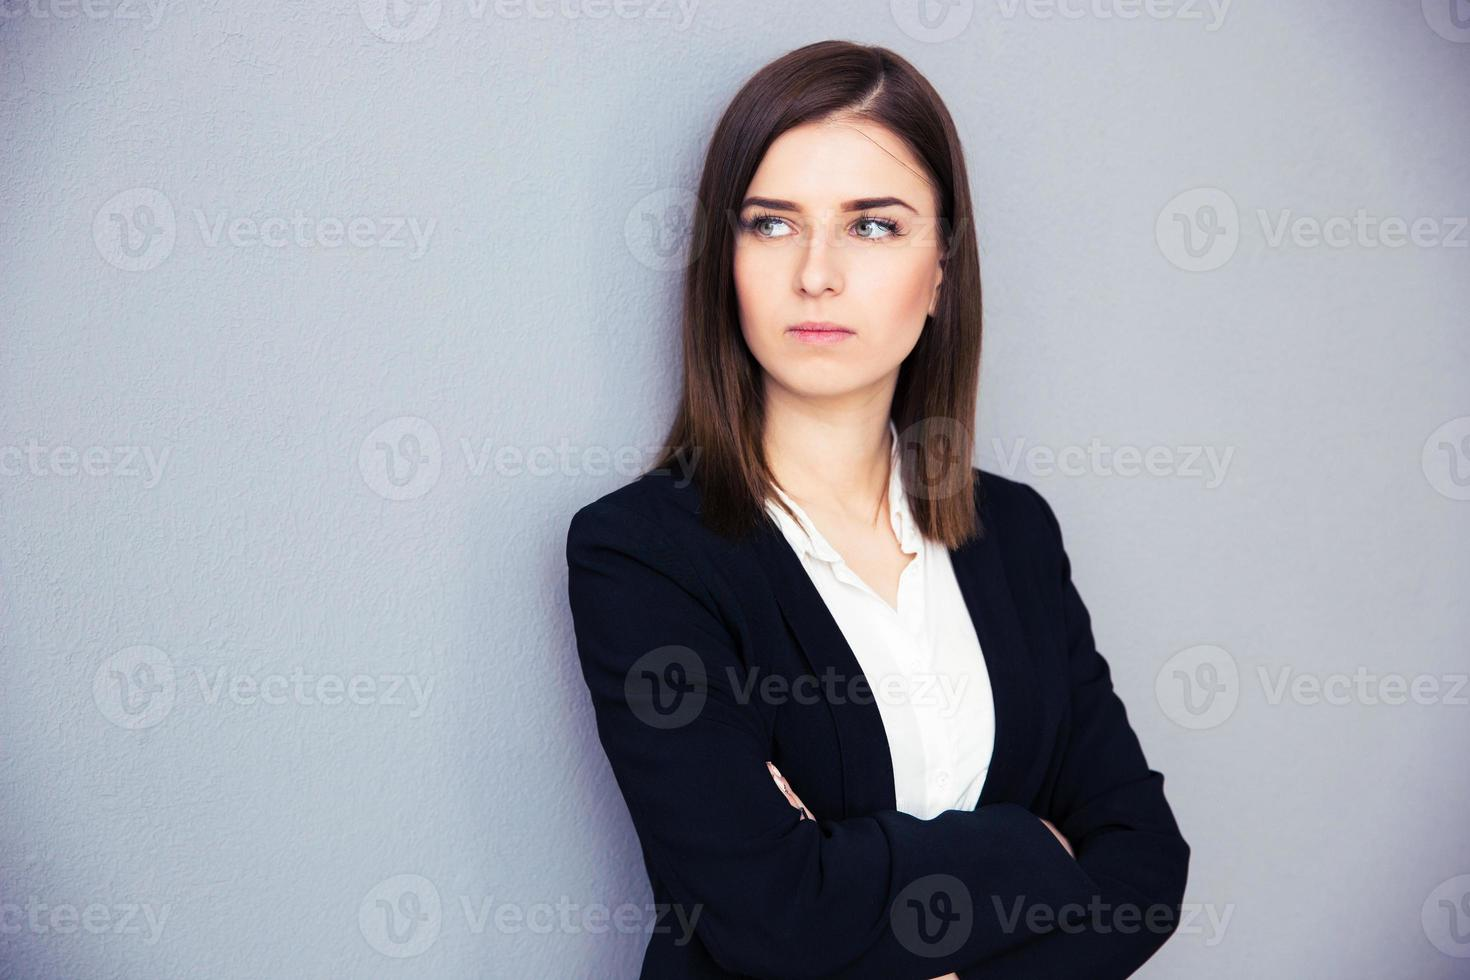 jonge ernstige zakenvrouw met gevouwen armen foto